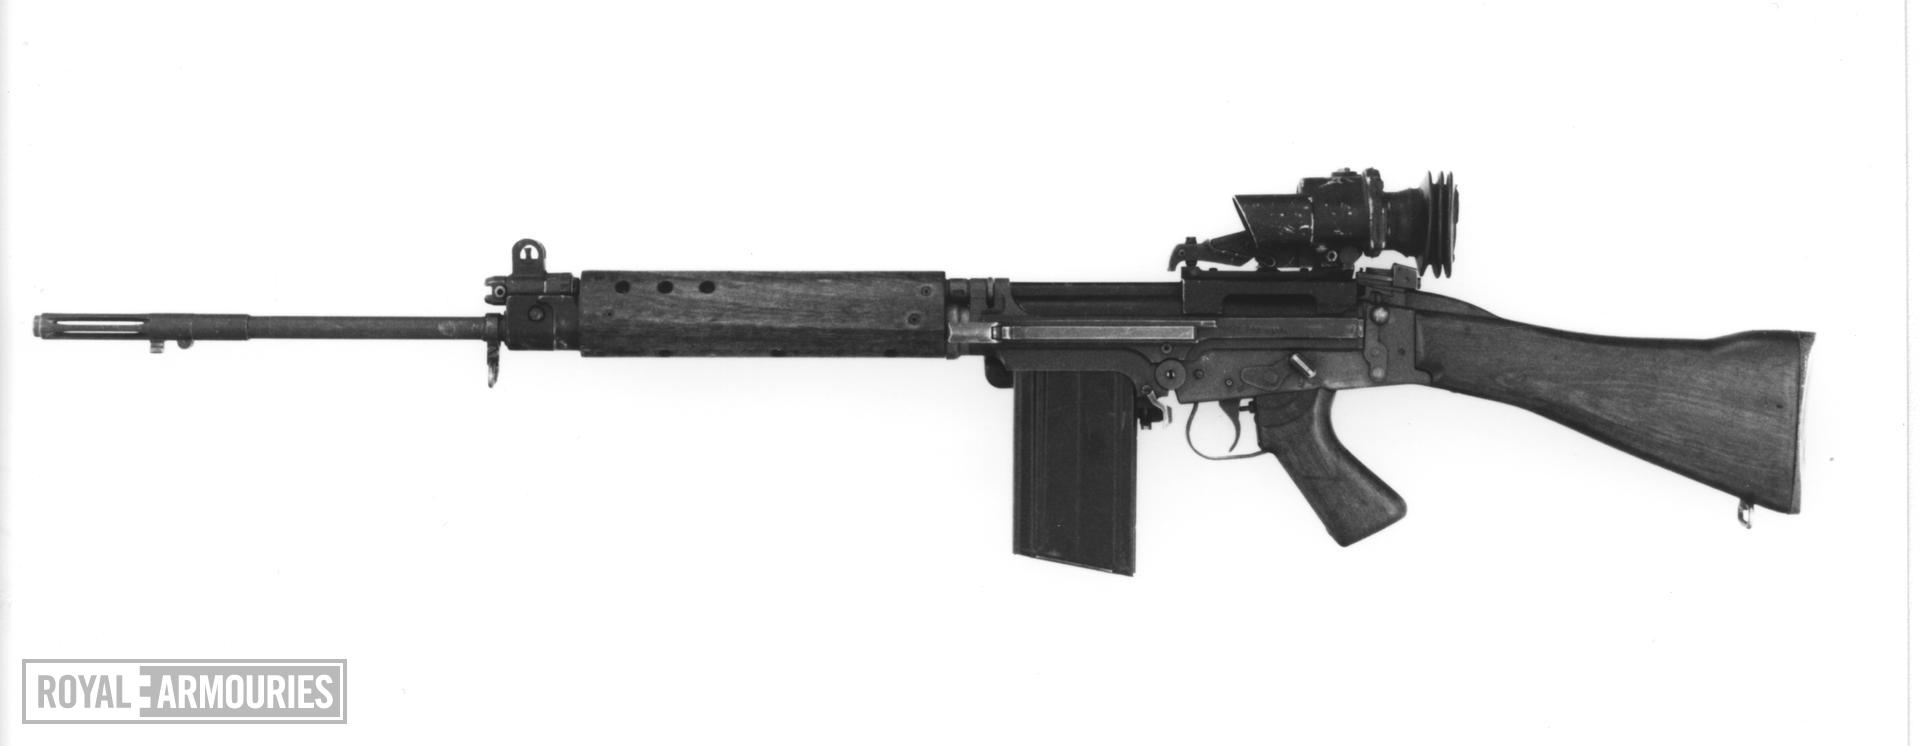 Centrefire self-loading magazine military rifle - L1A1 rifle